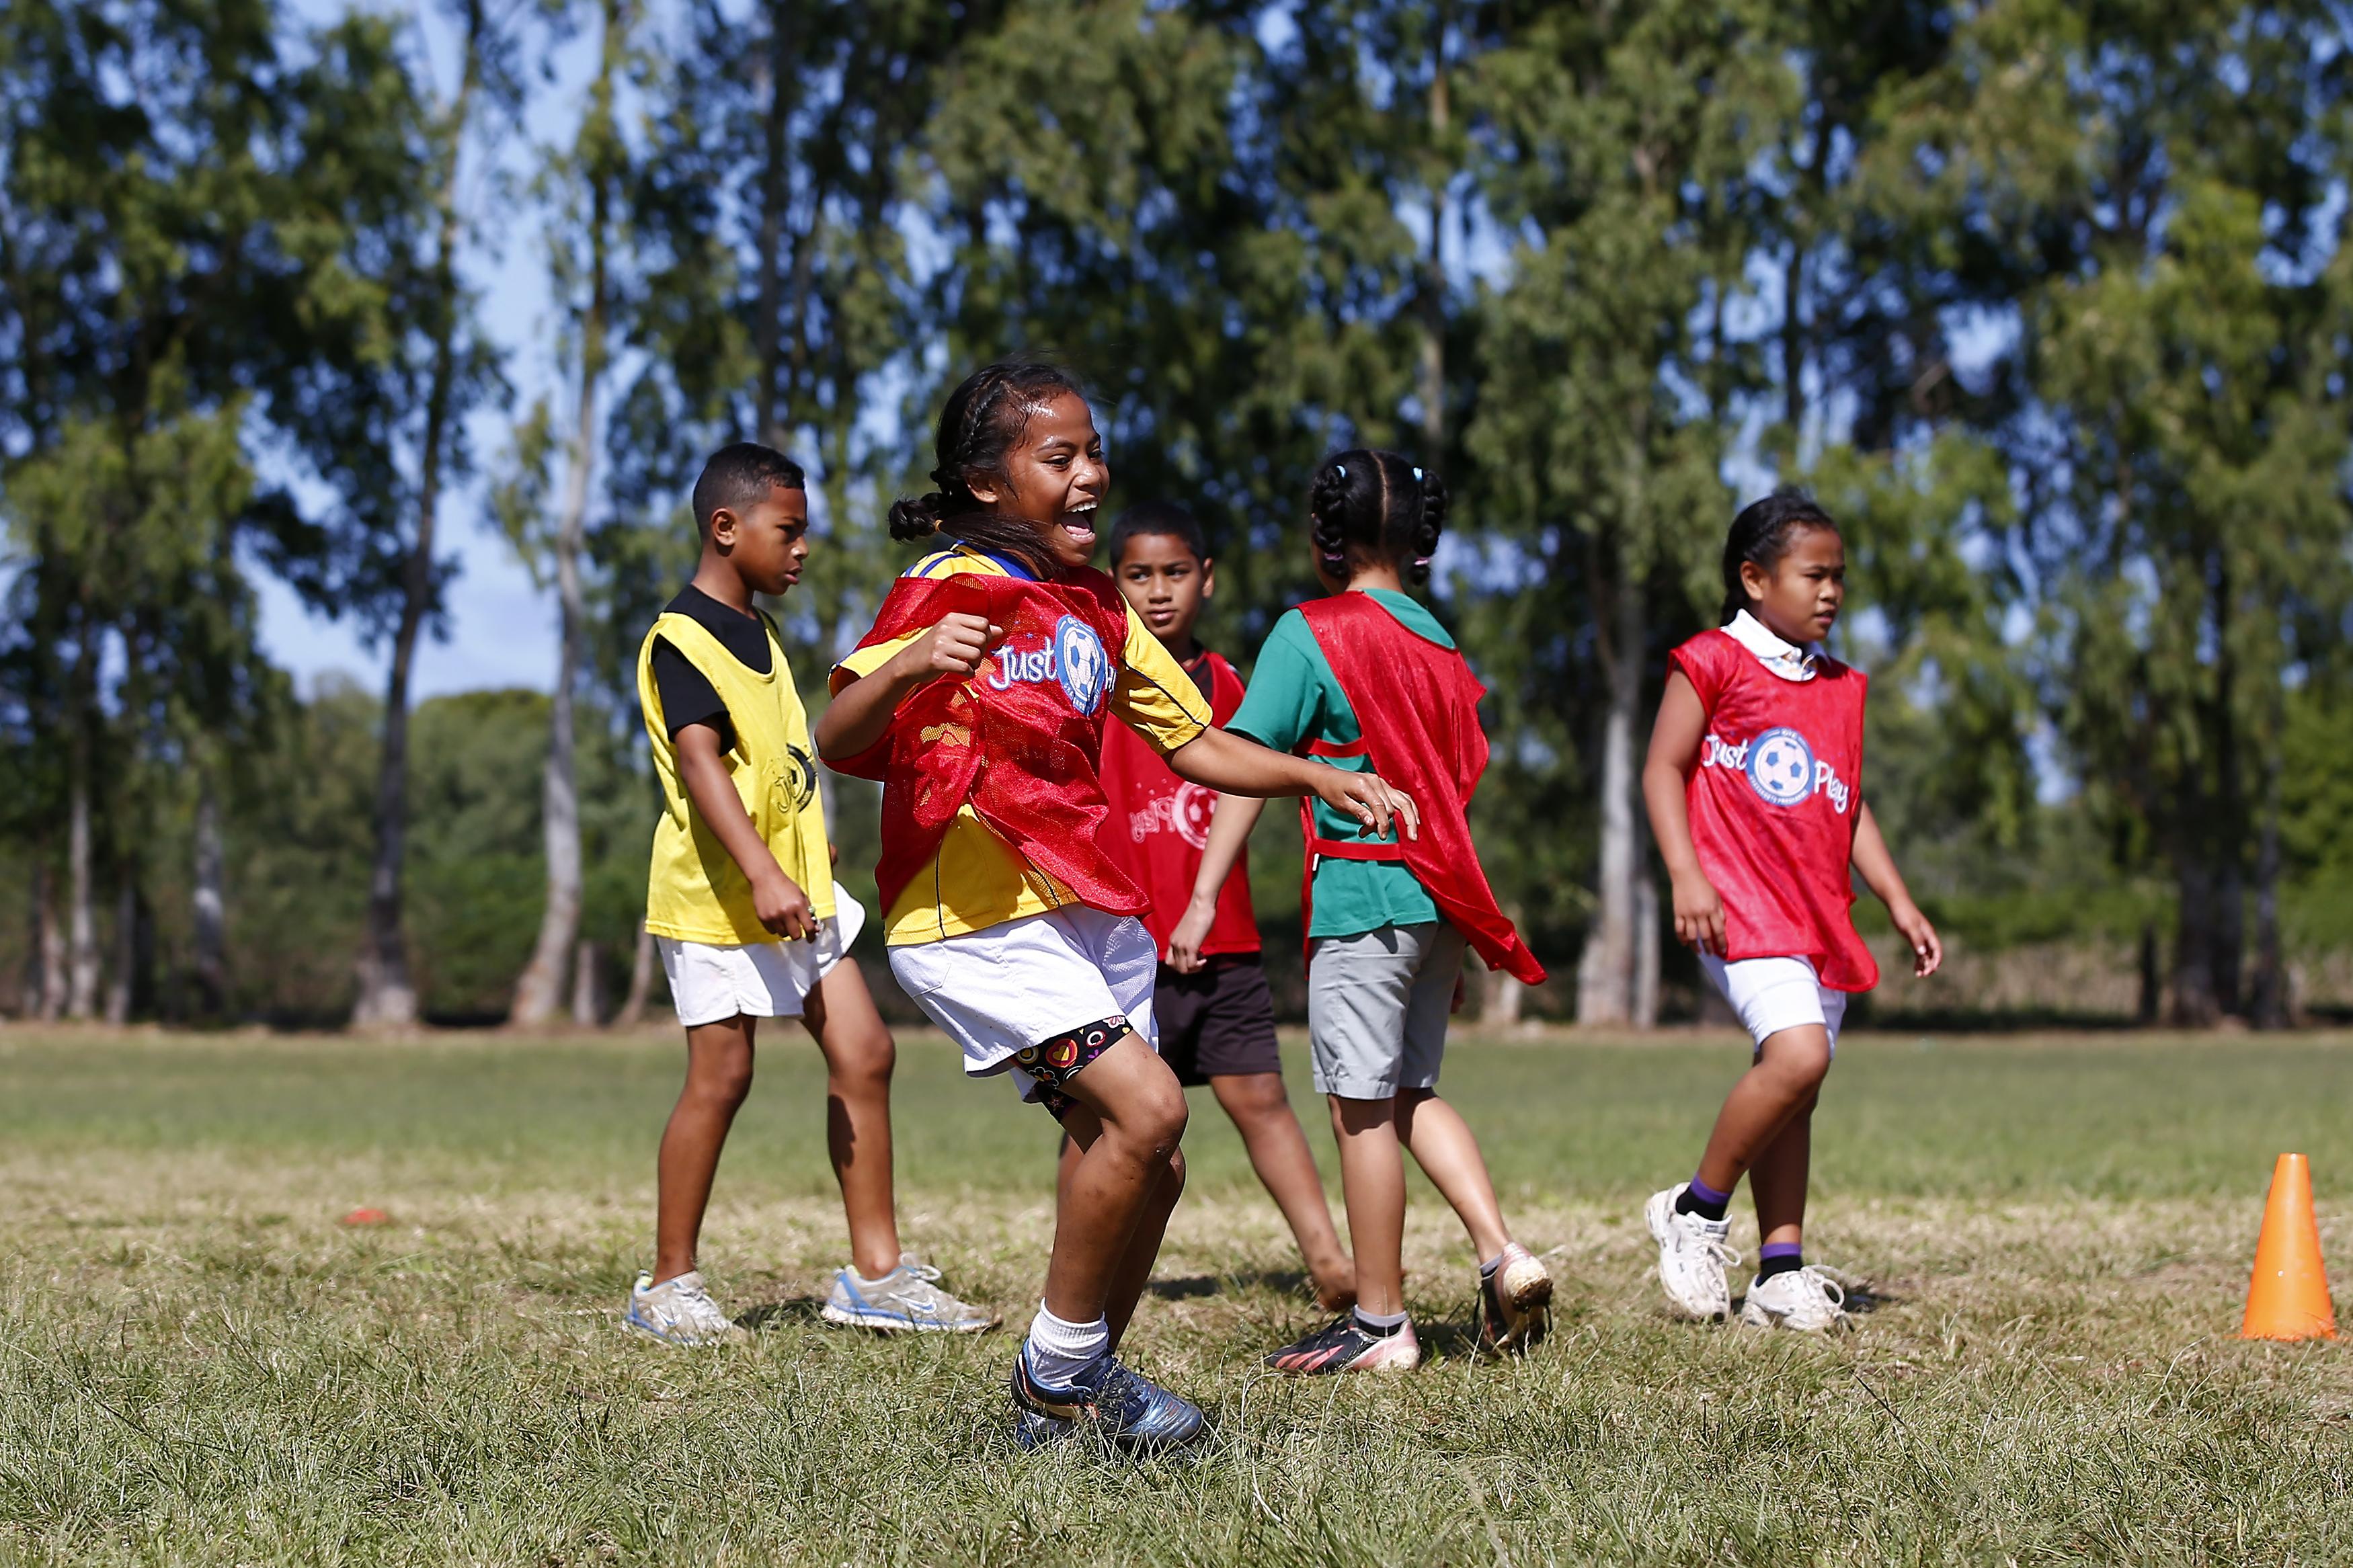 Just Play - Just Play Festival, Nuku'alofa, Tonga, Saturday 29th August 2015. Photo: Shane Wenzlick / www.phototek.nz